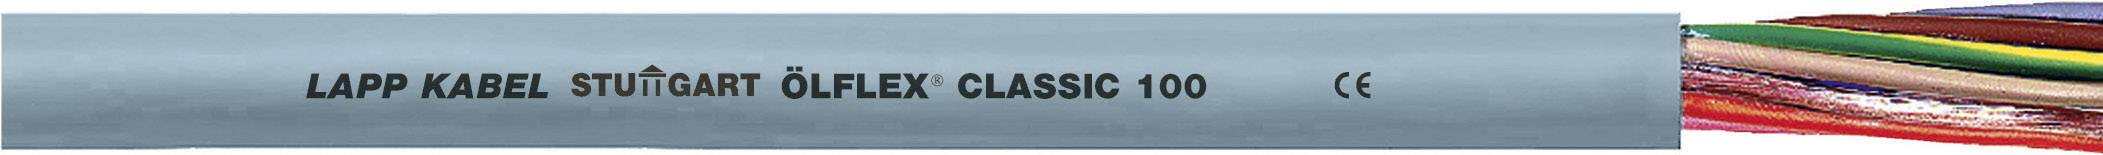 Kabel LappKabel Ölflex CLASSIC 100 4G0,75 (00100234), PVC, 6,2 mm, 500 V, šedá, 50 m